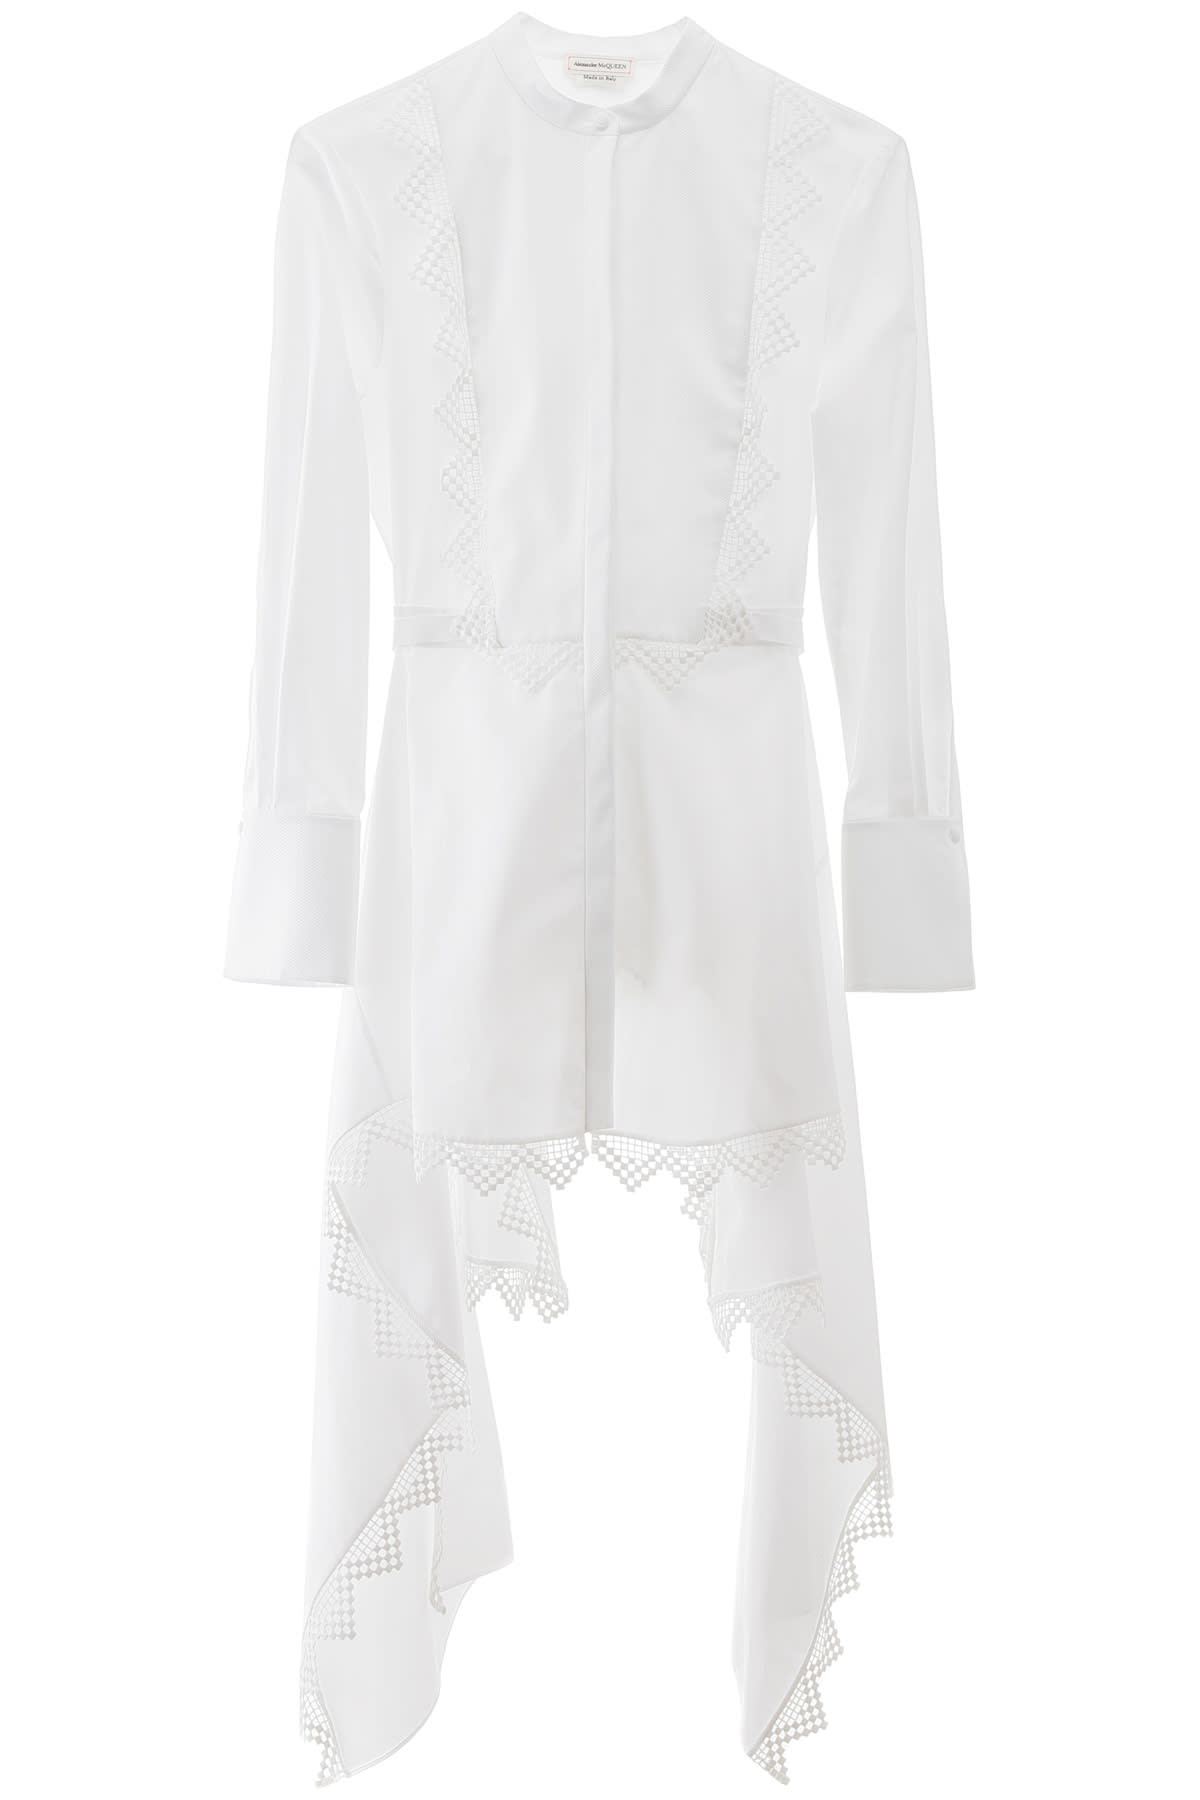 Alexander McQueen Asymmetrical Shirt With Lace Details